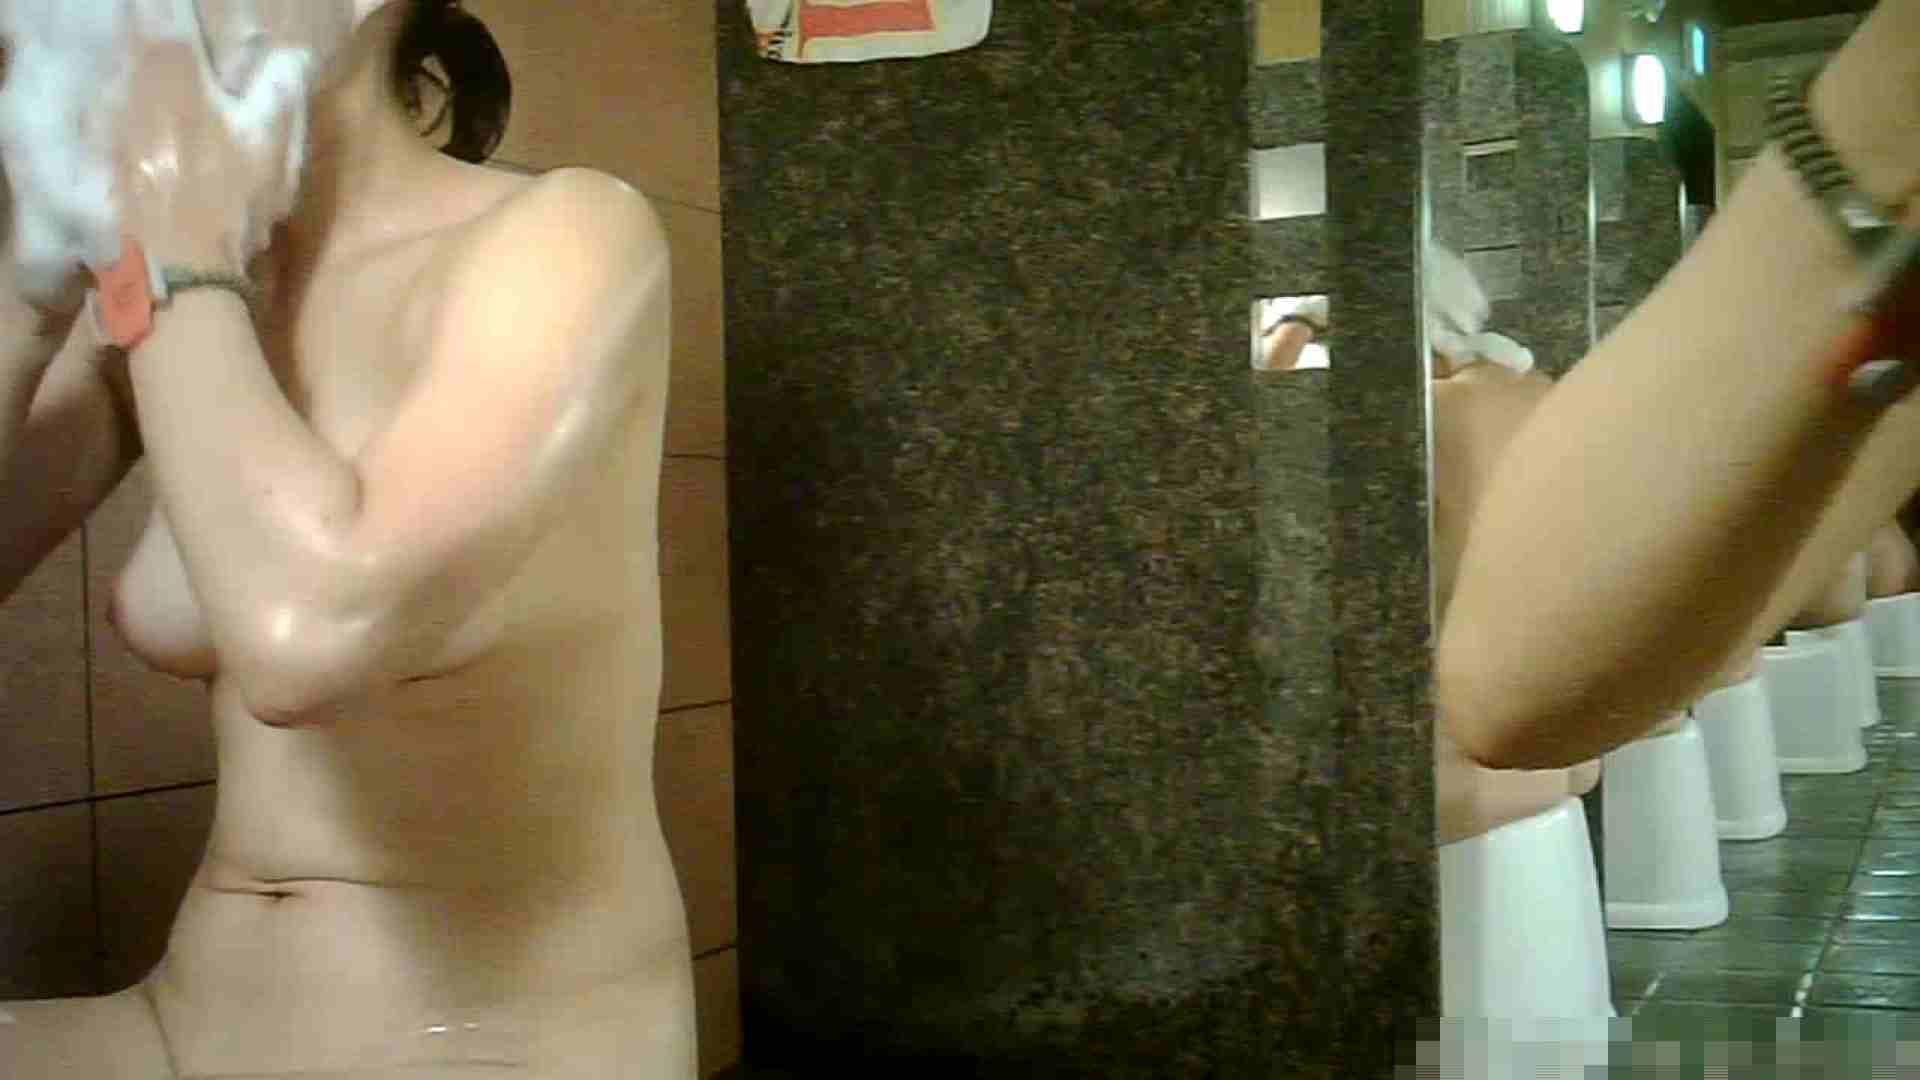 No.1 洗い場!!とっても綺麗な身体のお女市さん、乳首も綺麗です。 女湯 戯れ無修正画像 98画像 93